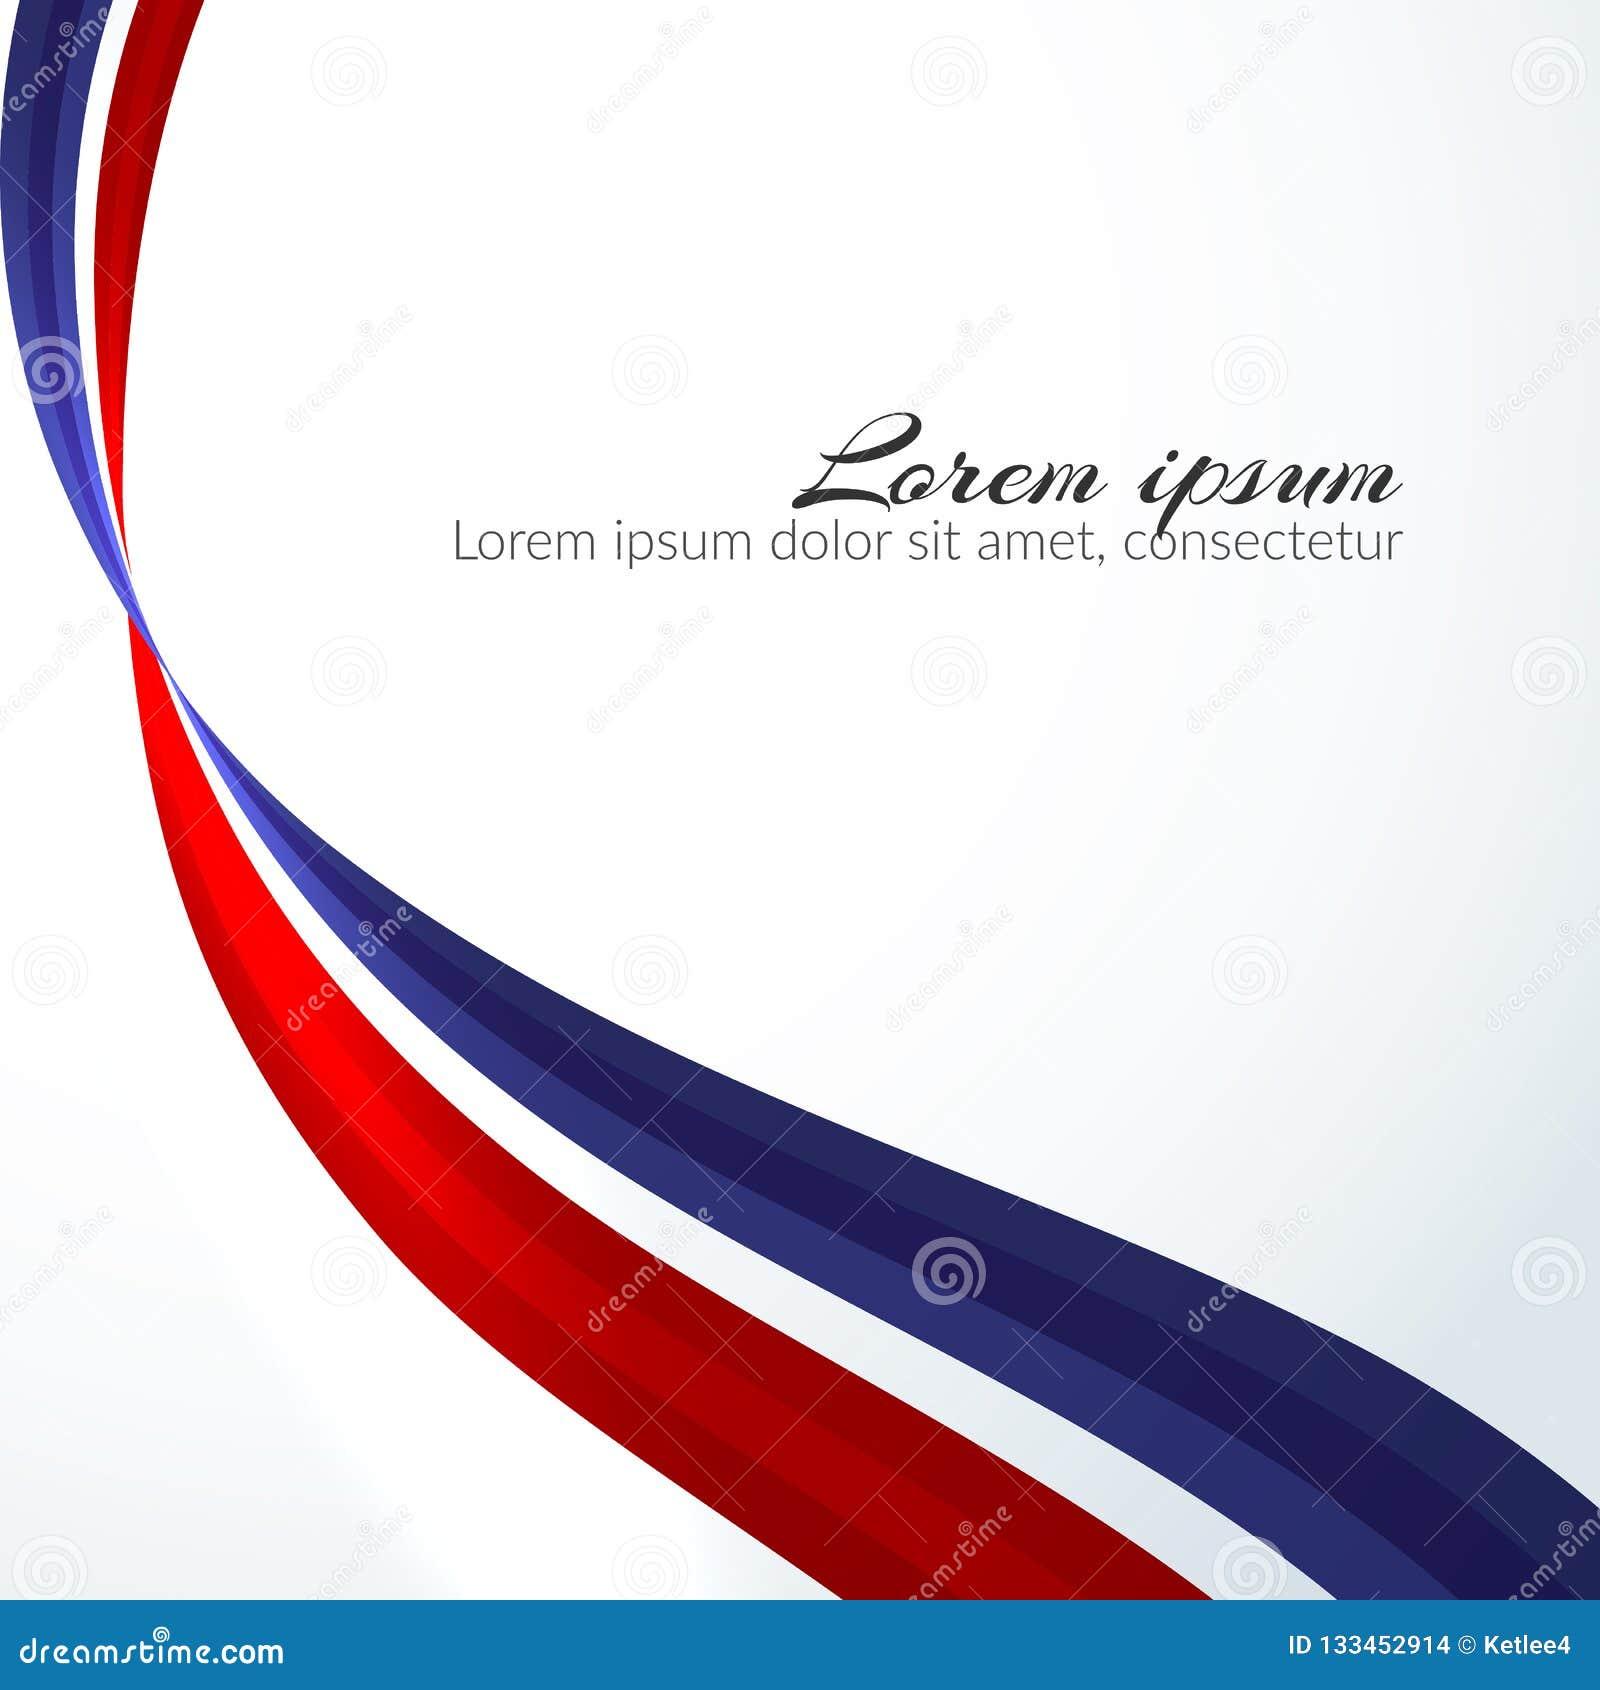 Fundo patriótico das cores da bandeira nacional de linhas onduladas abstratas de fluxo elemento de Rússia para o projeto da bande